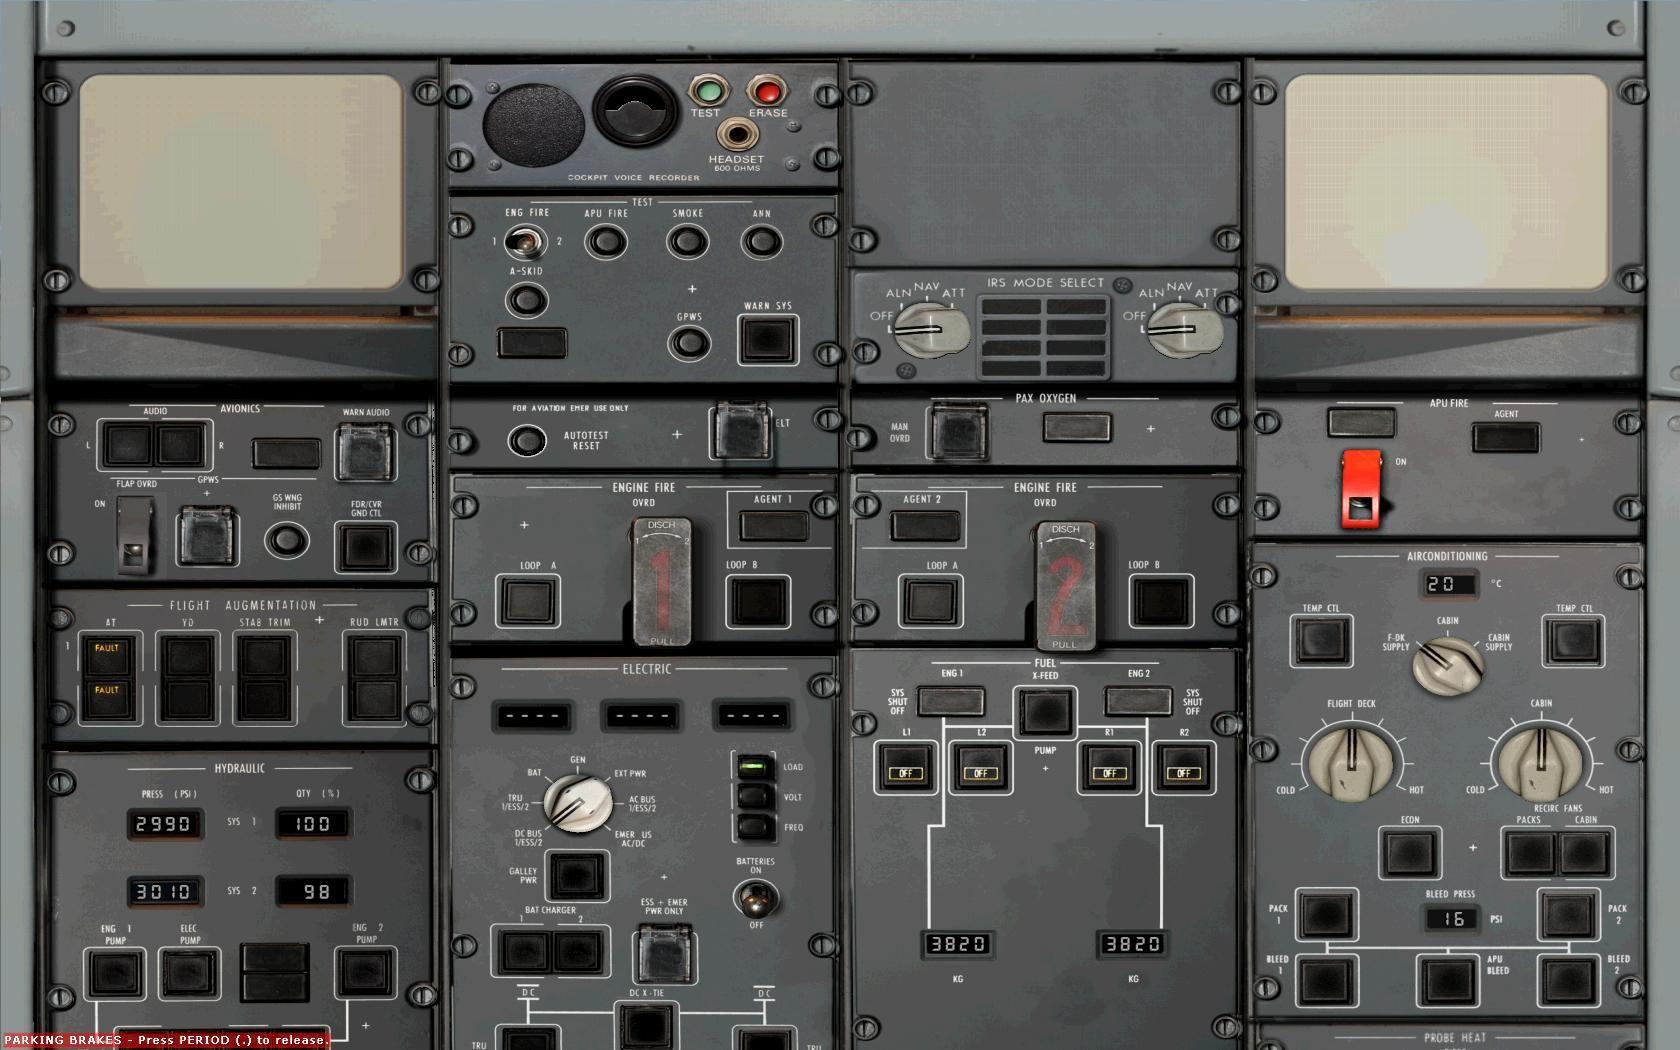 Spaceship Control Panel Printable Spaceship Wiring Diagram And ...